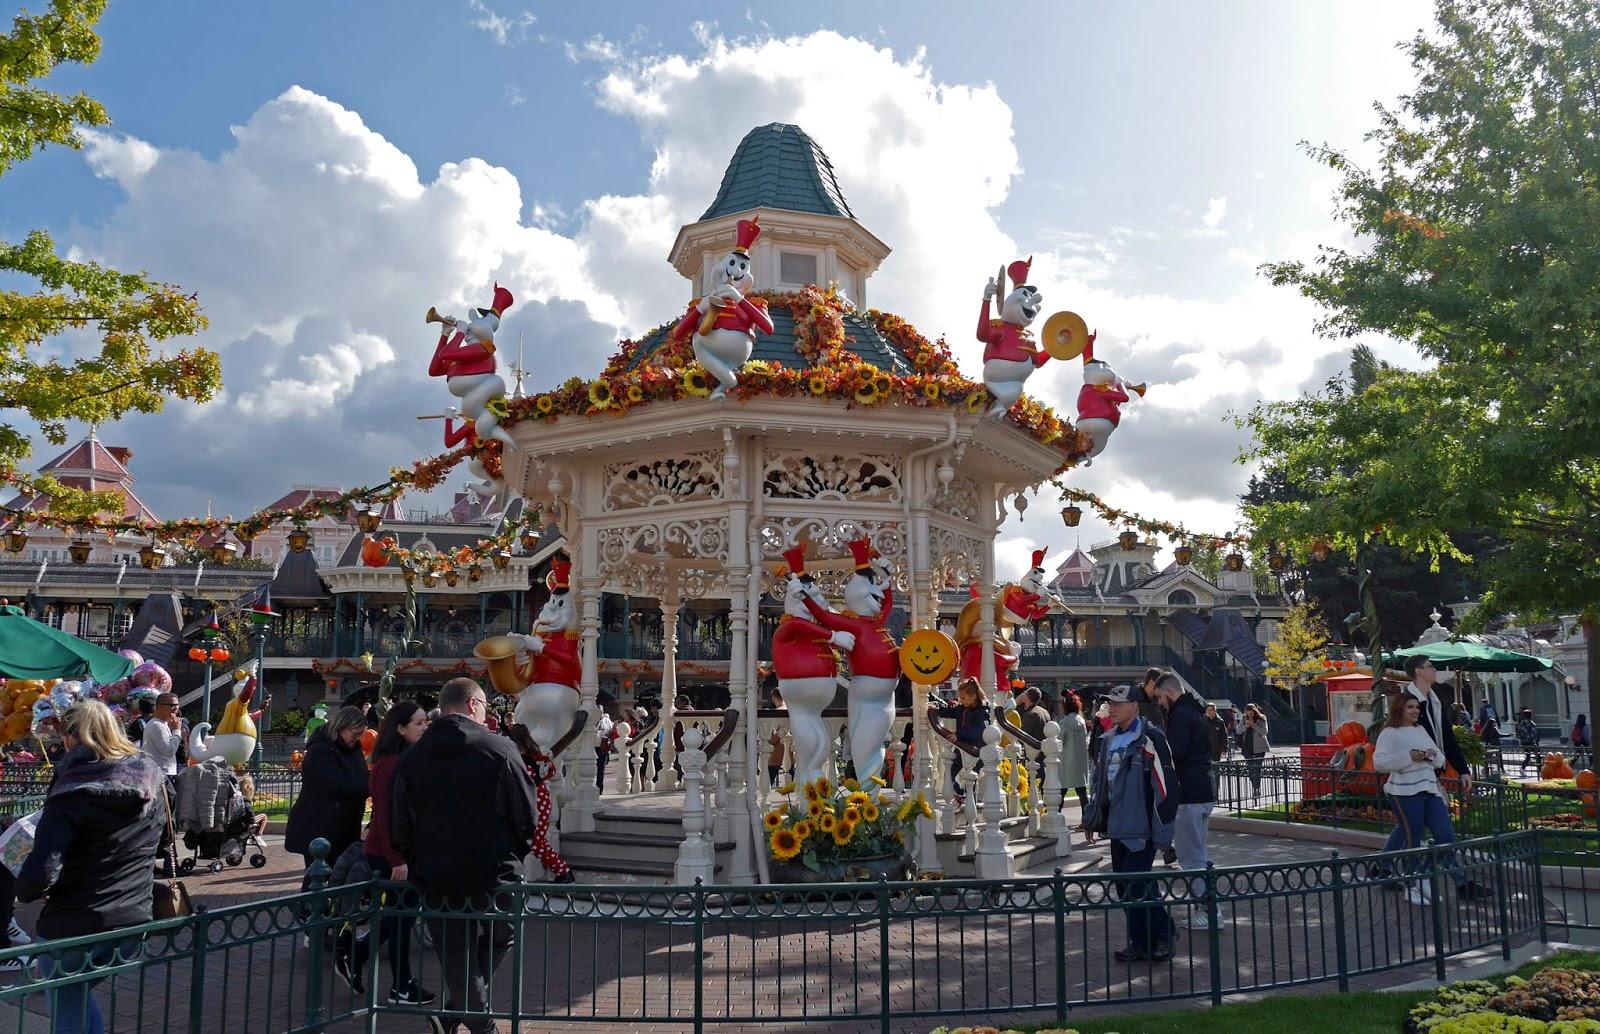 Ghost-like characters and pumpkins on Main Street, Disneyland Paris